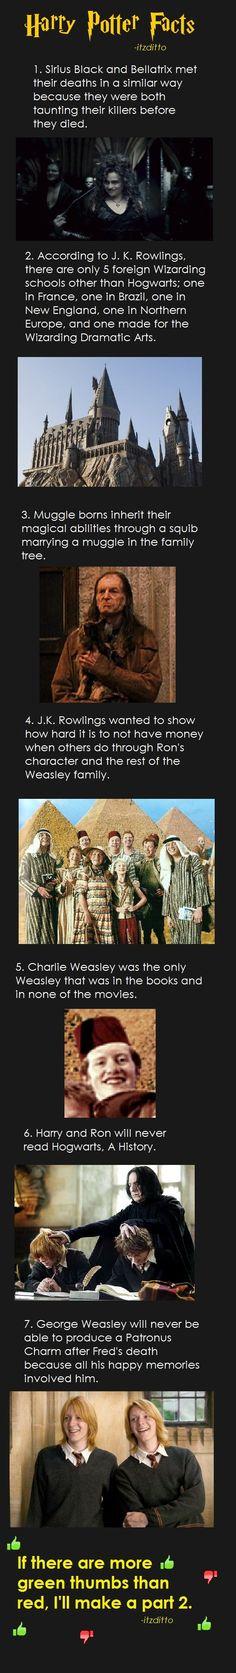 Harry Potter Facts, part 1